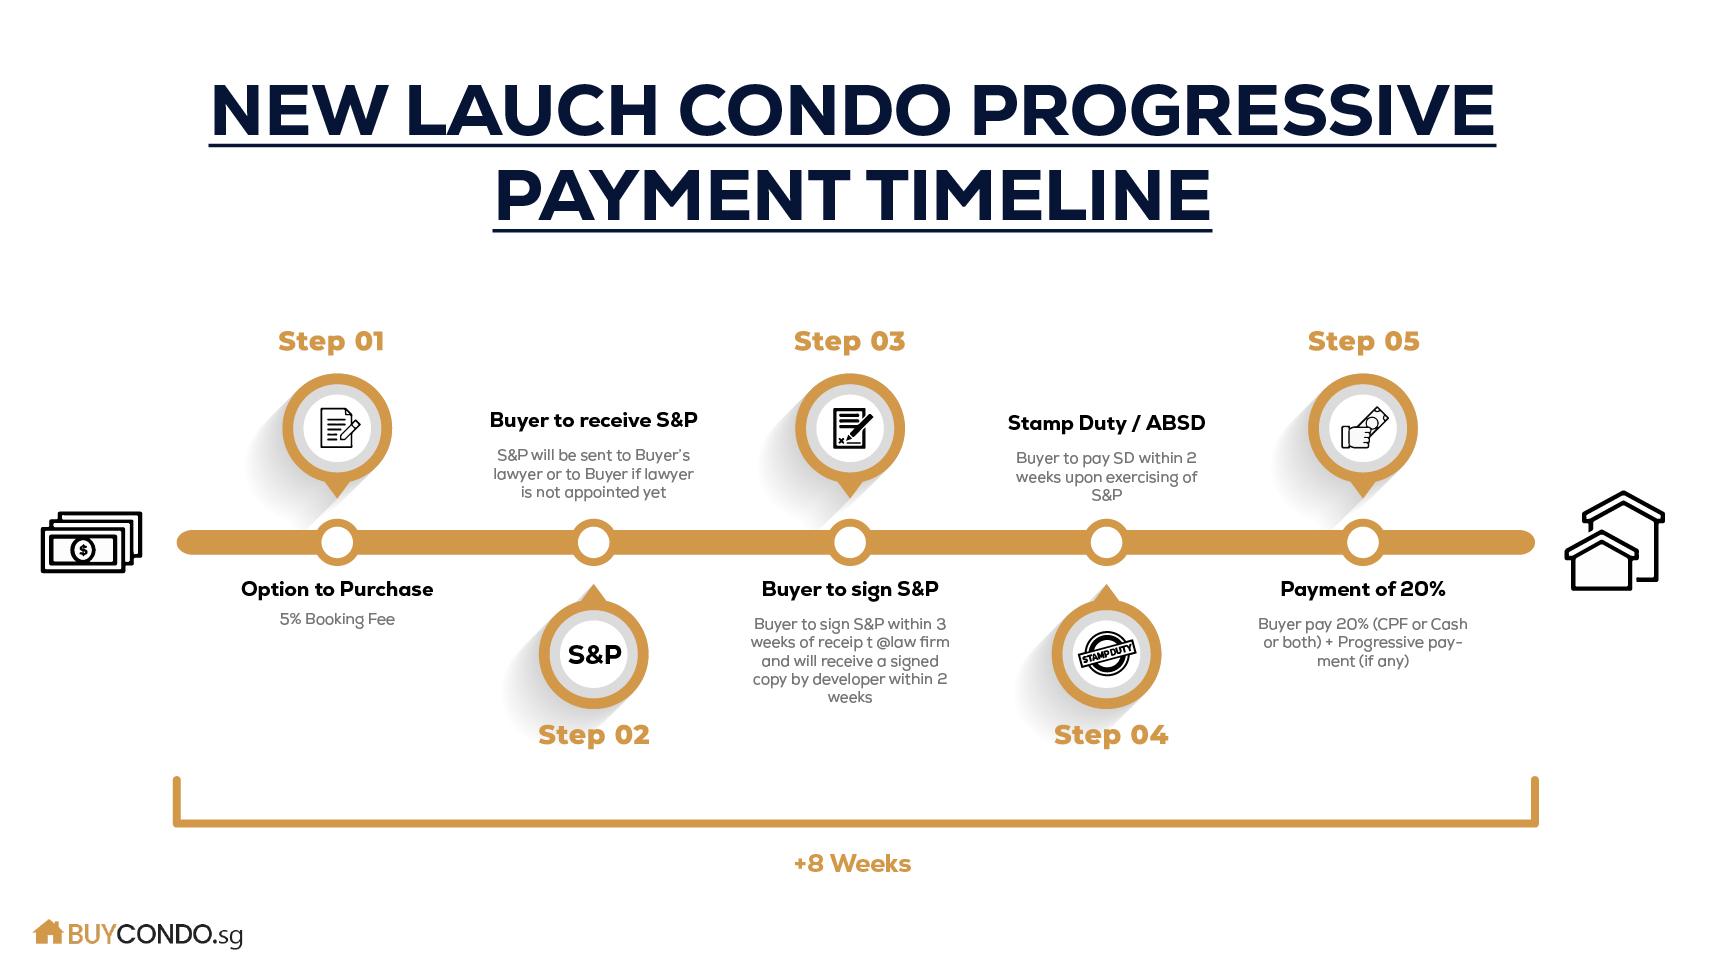 New Launch Condo Progressive Payment Timeline